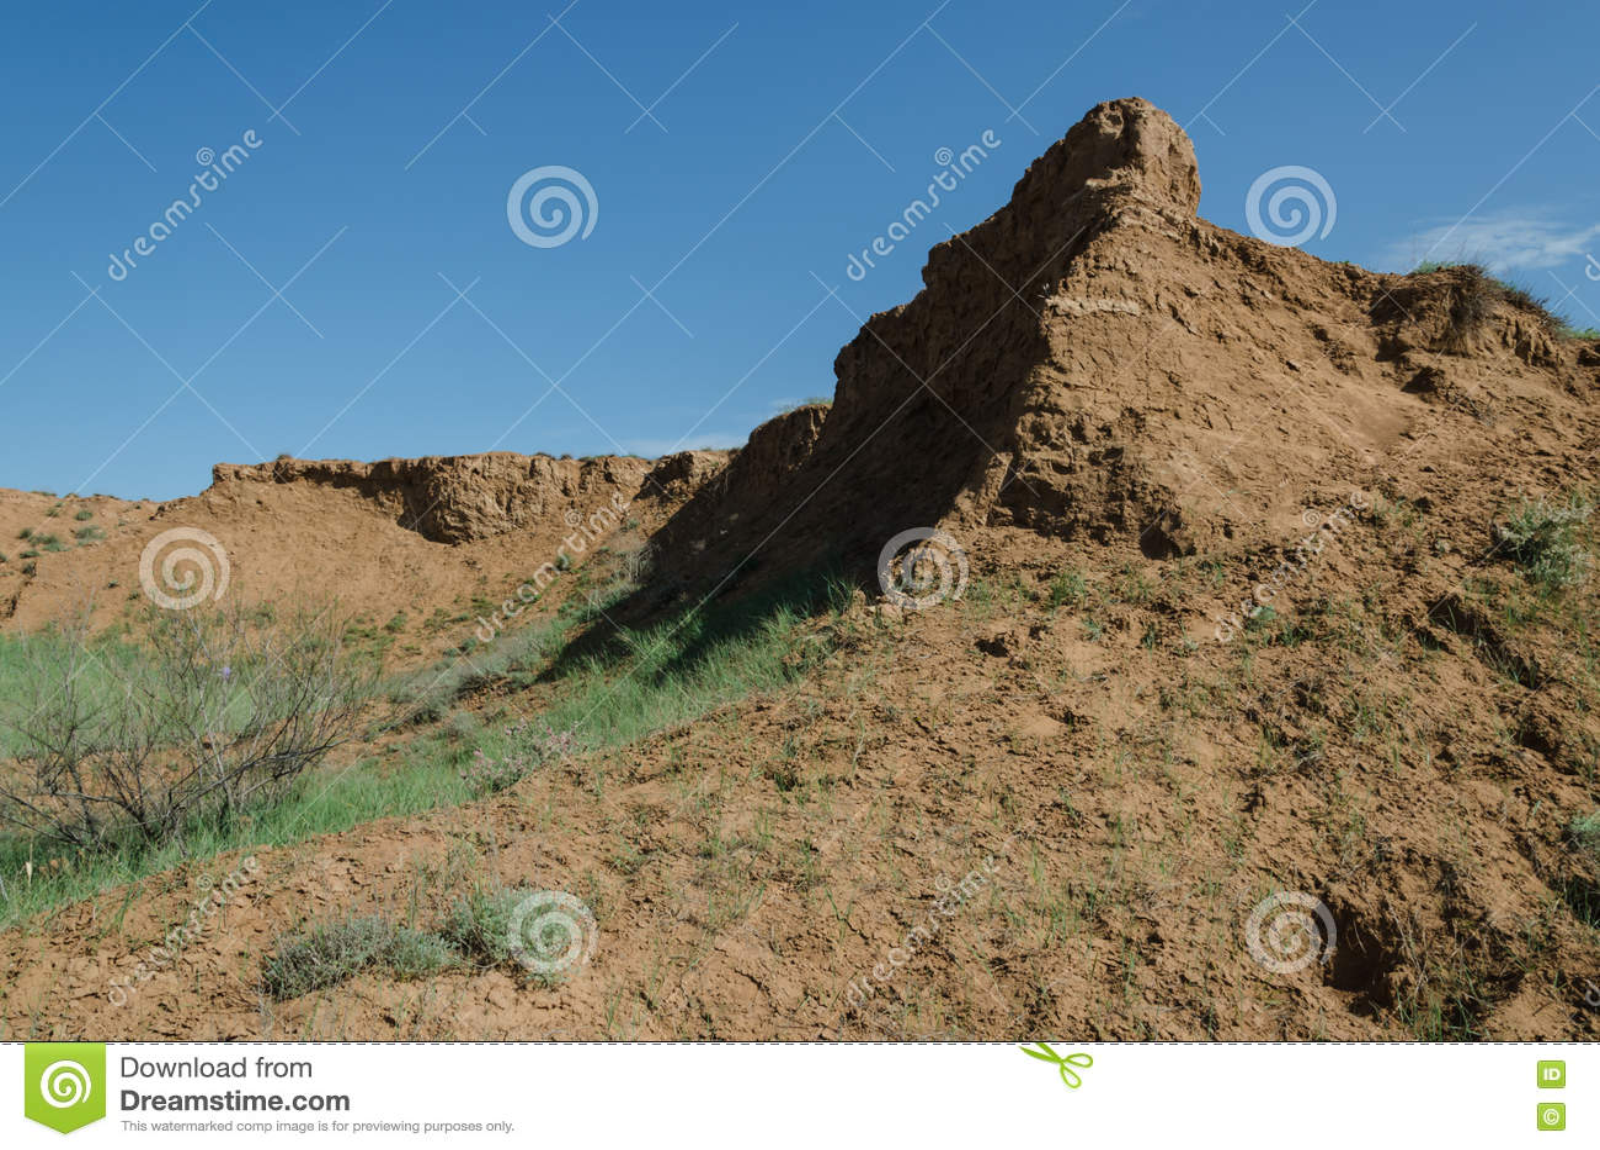 Prairie Mountain in the background.